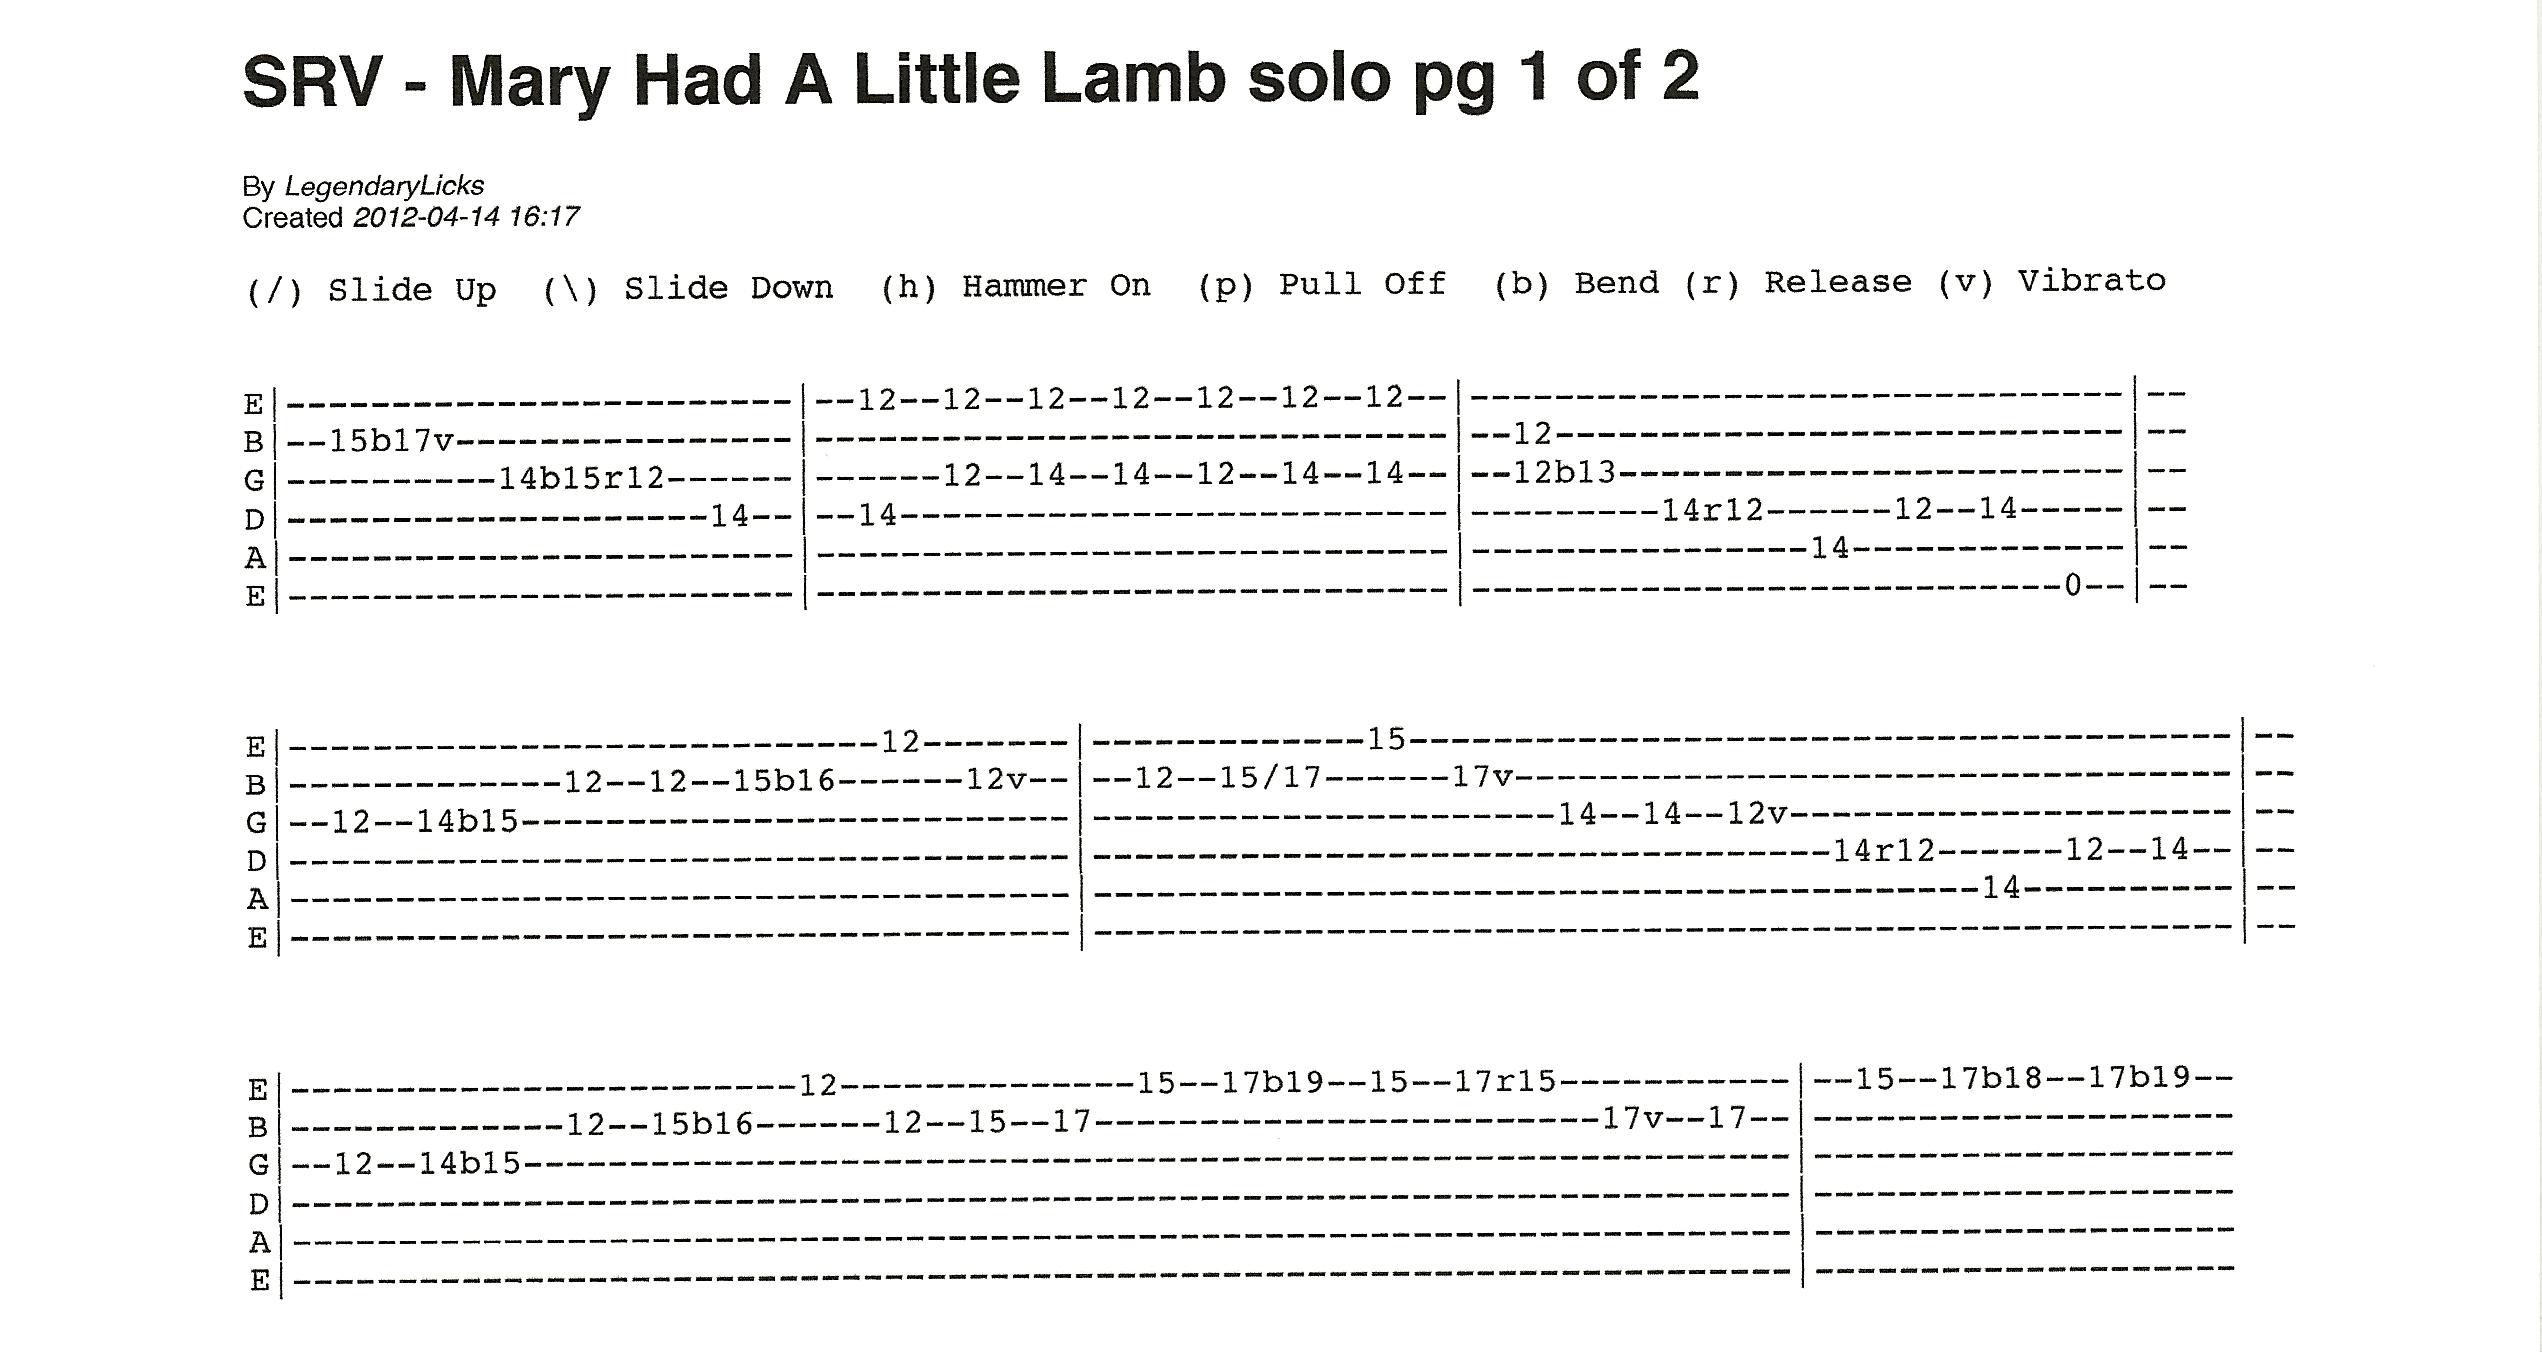 Mary Had A Little Lamb Rick Mccargars Guitar Licks Songs And